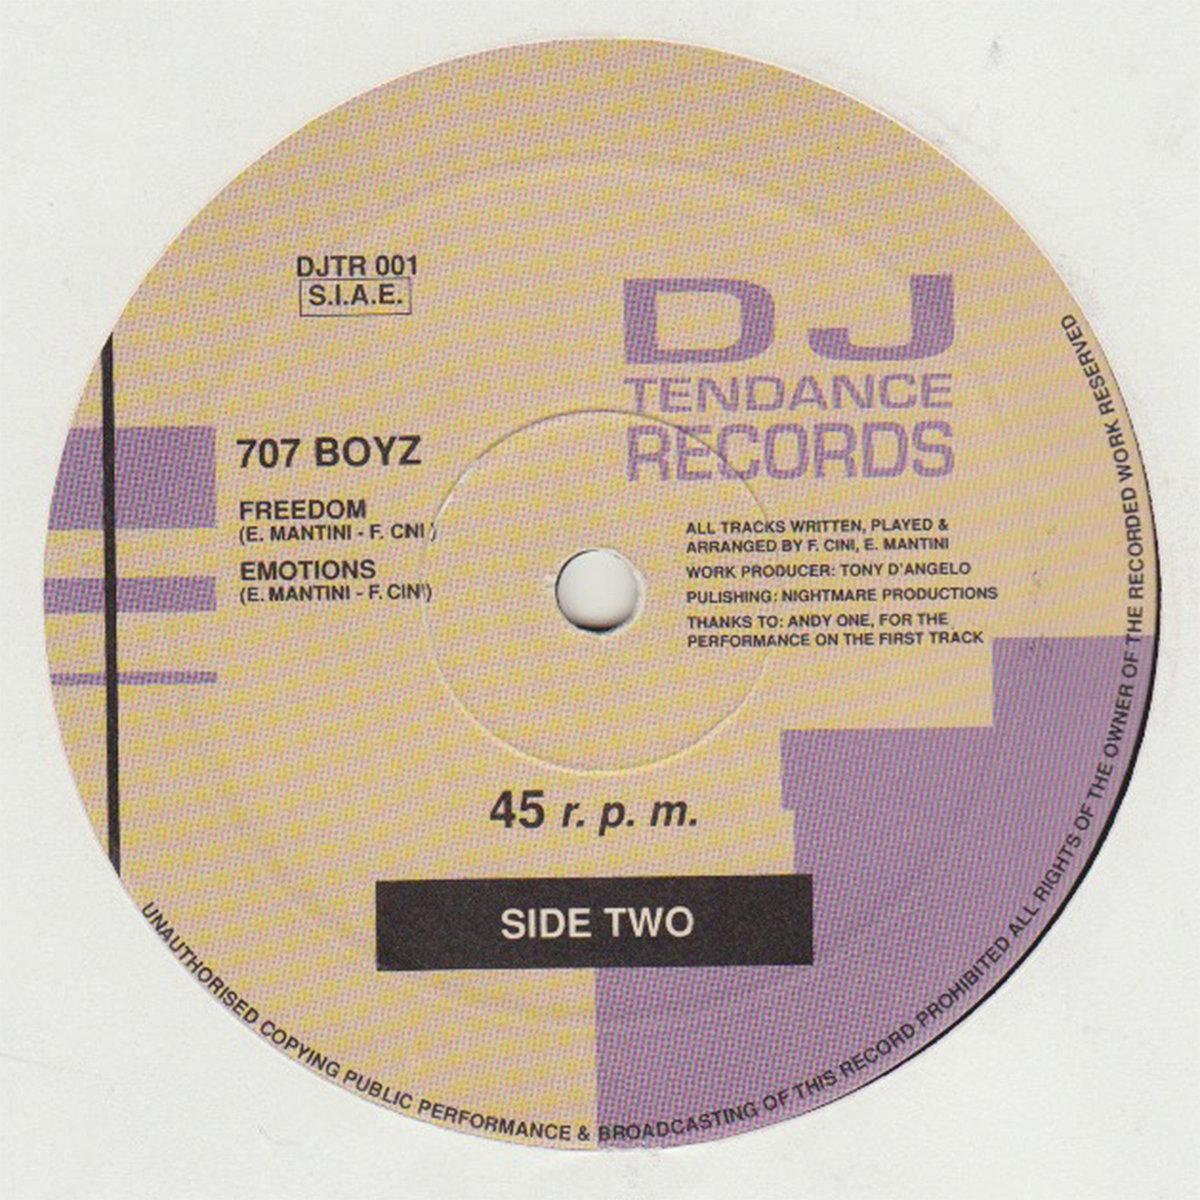 707 Boy EP - DJTR001 | Enrico Mantini